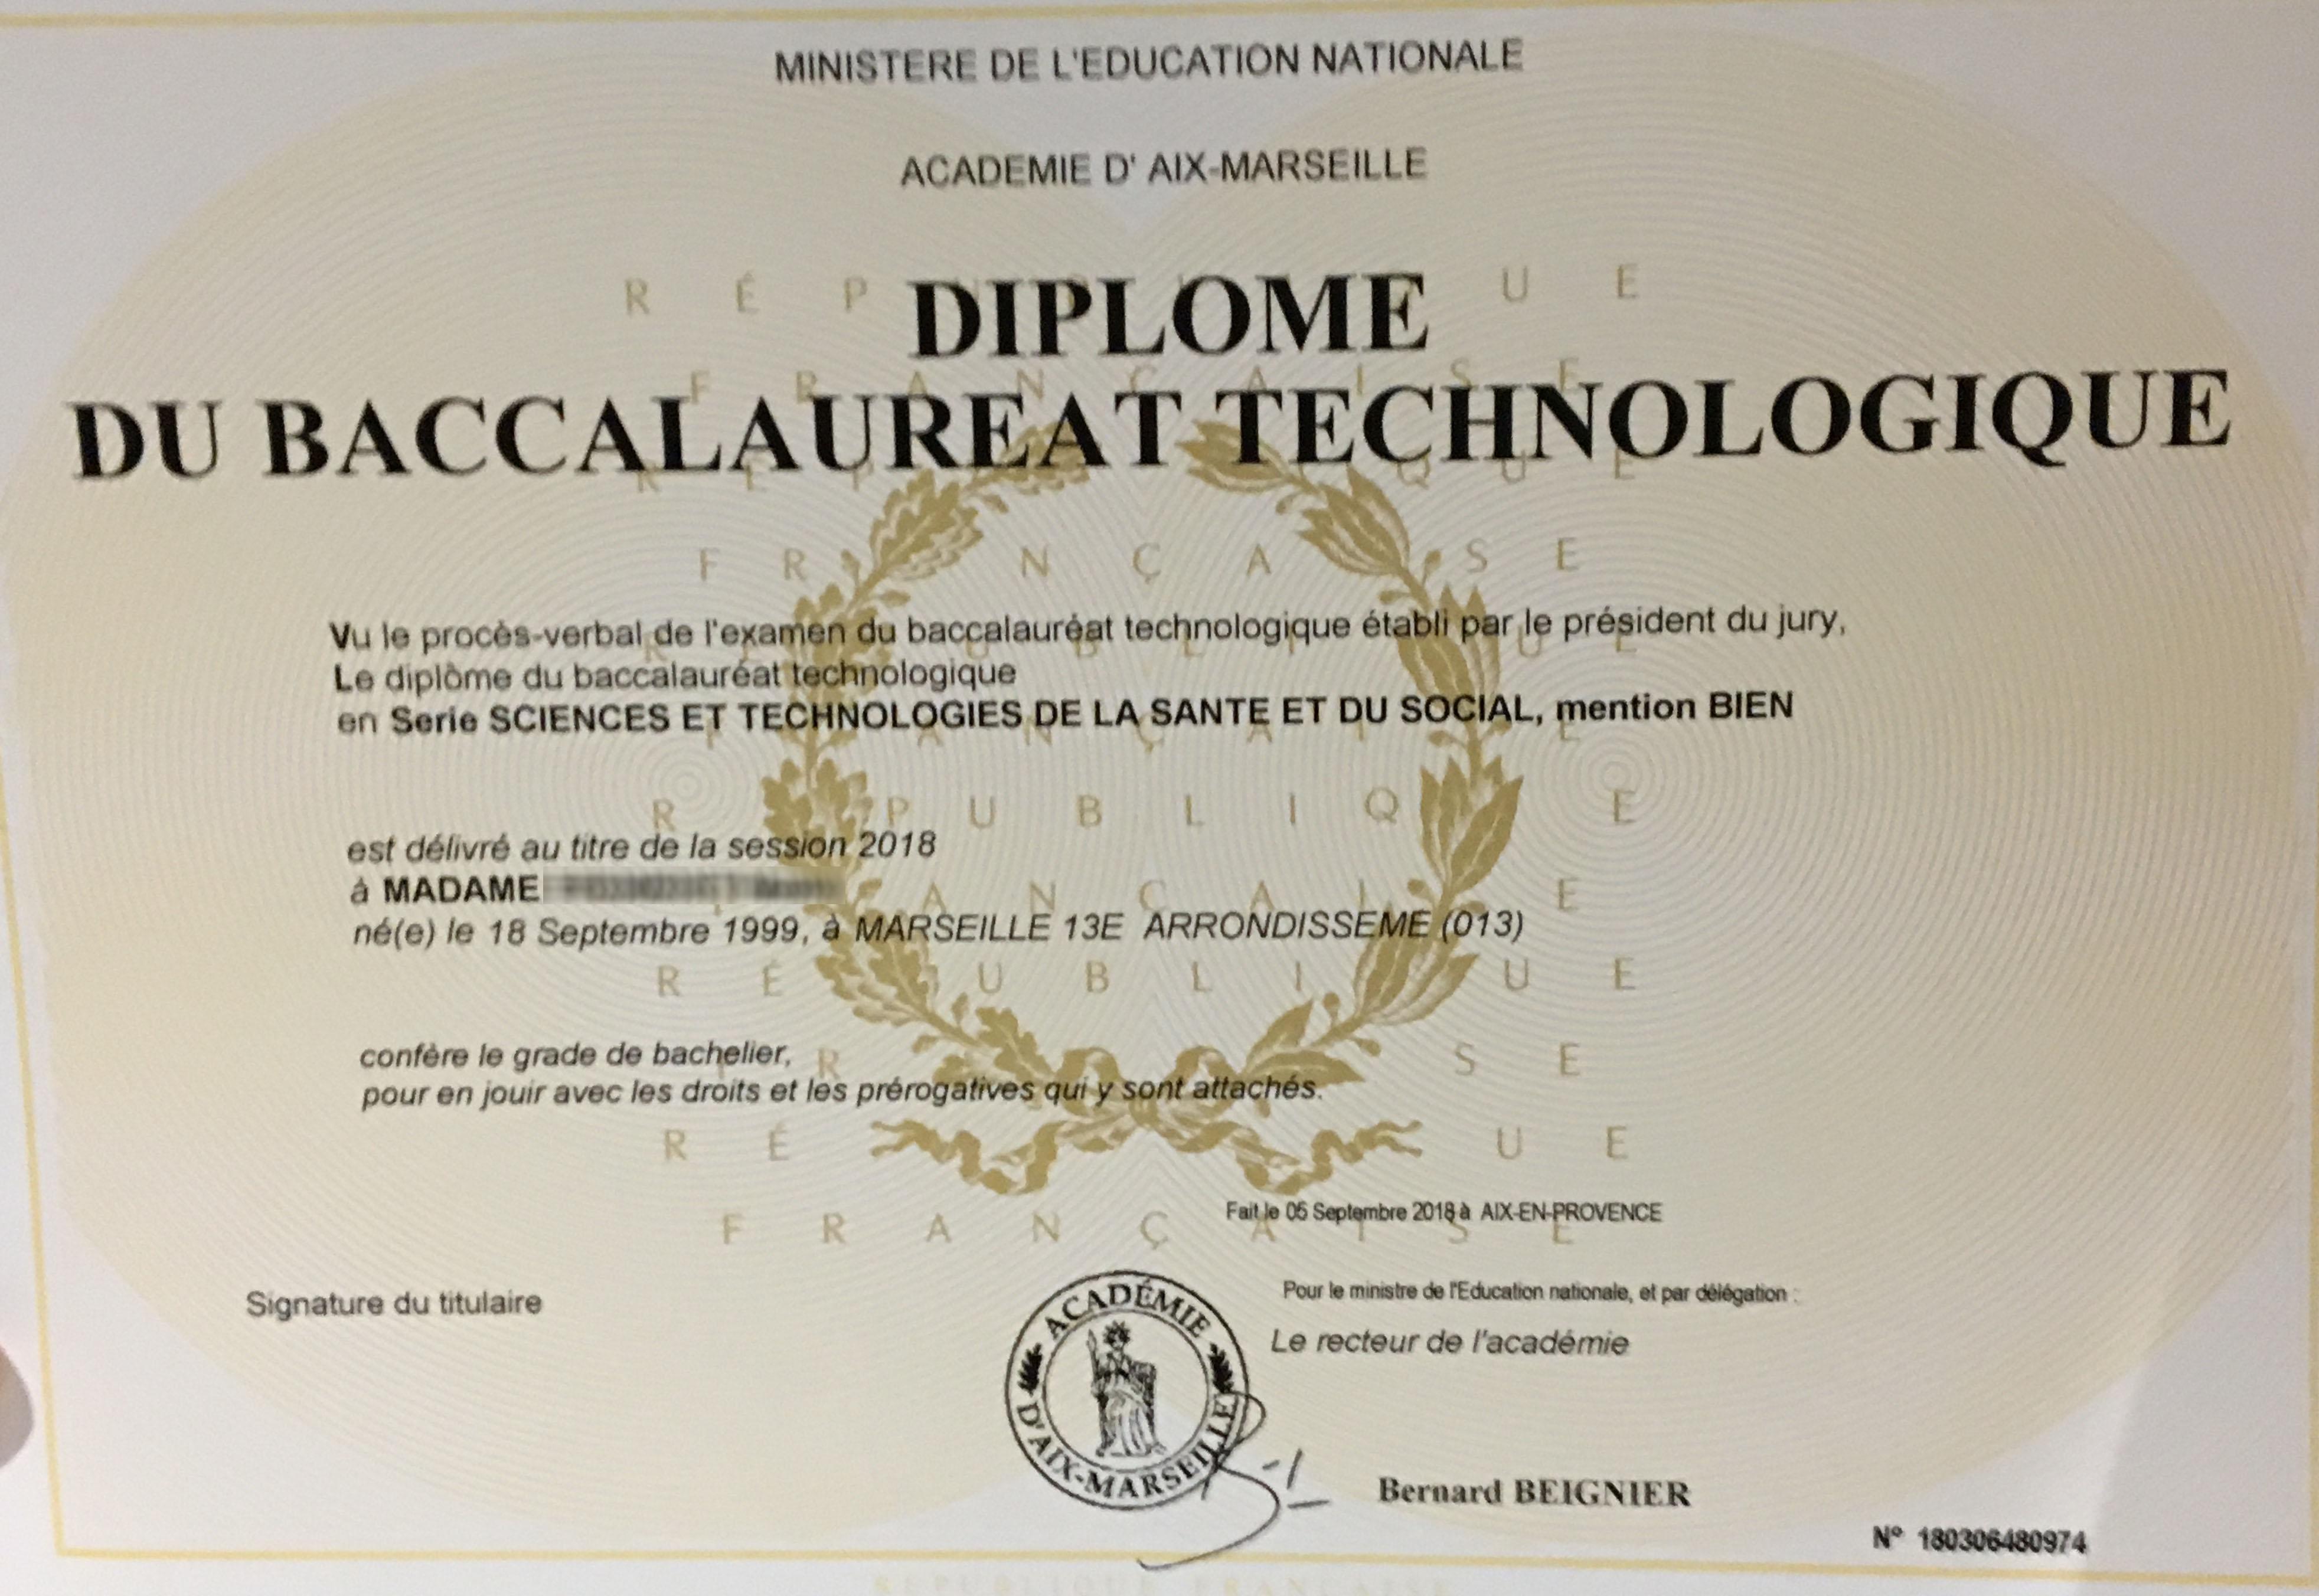 Diploma key data extraction